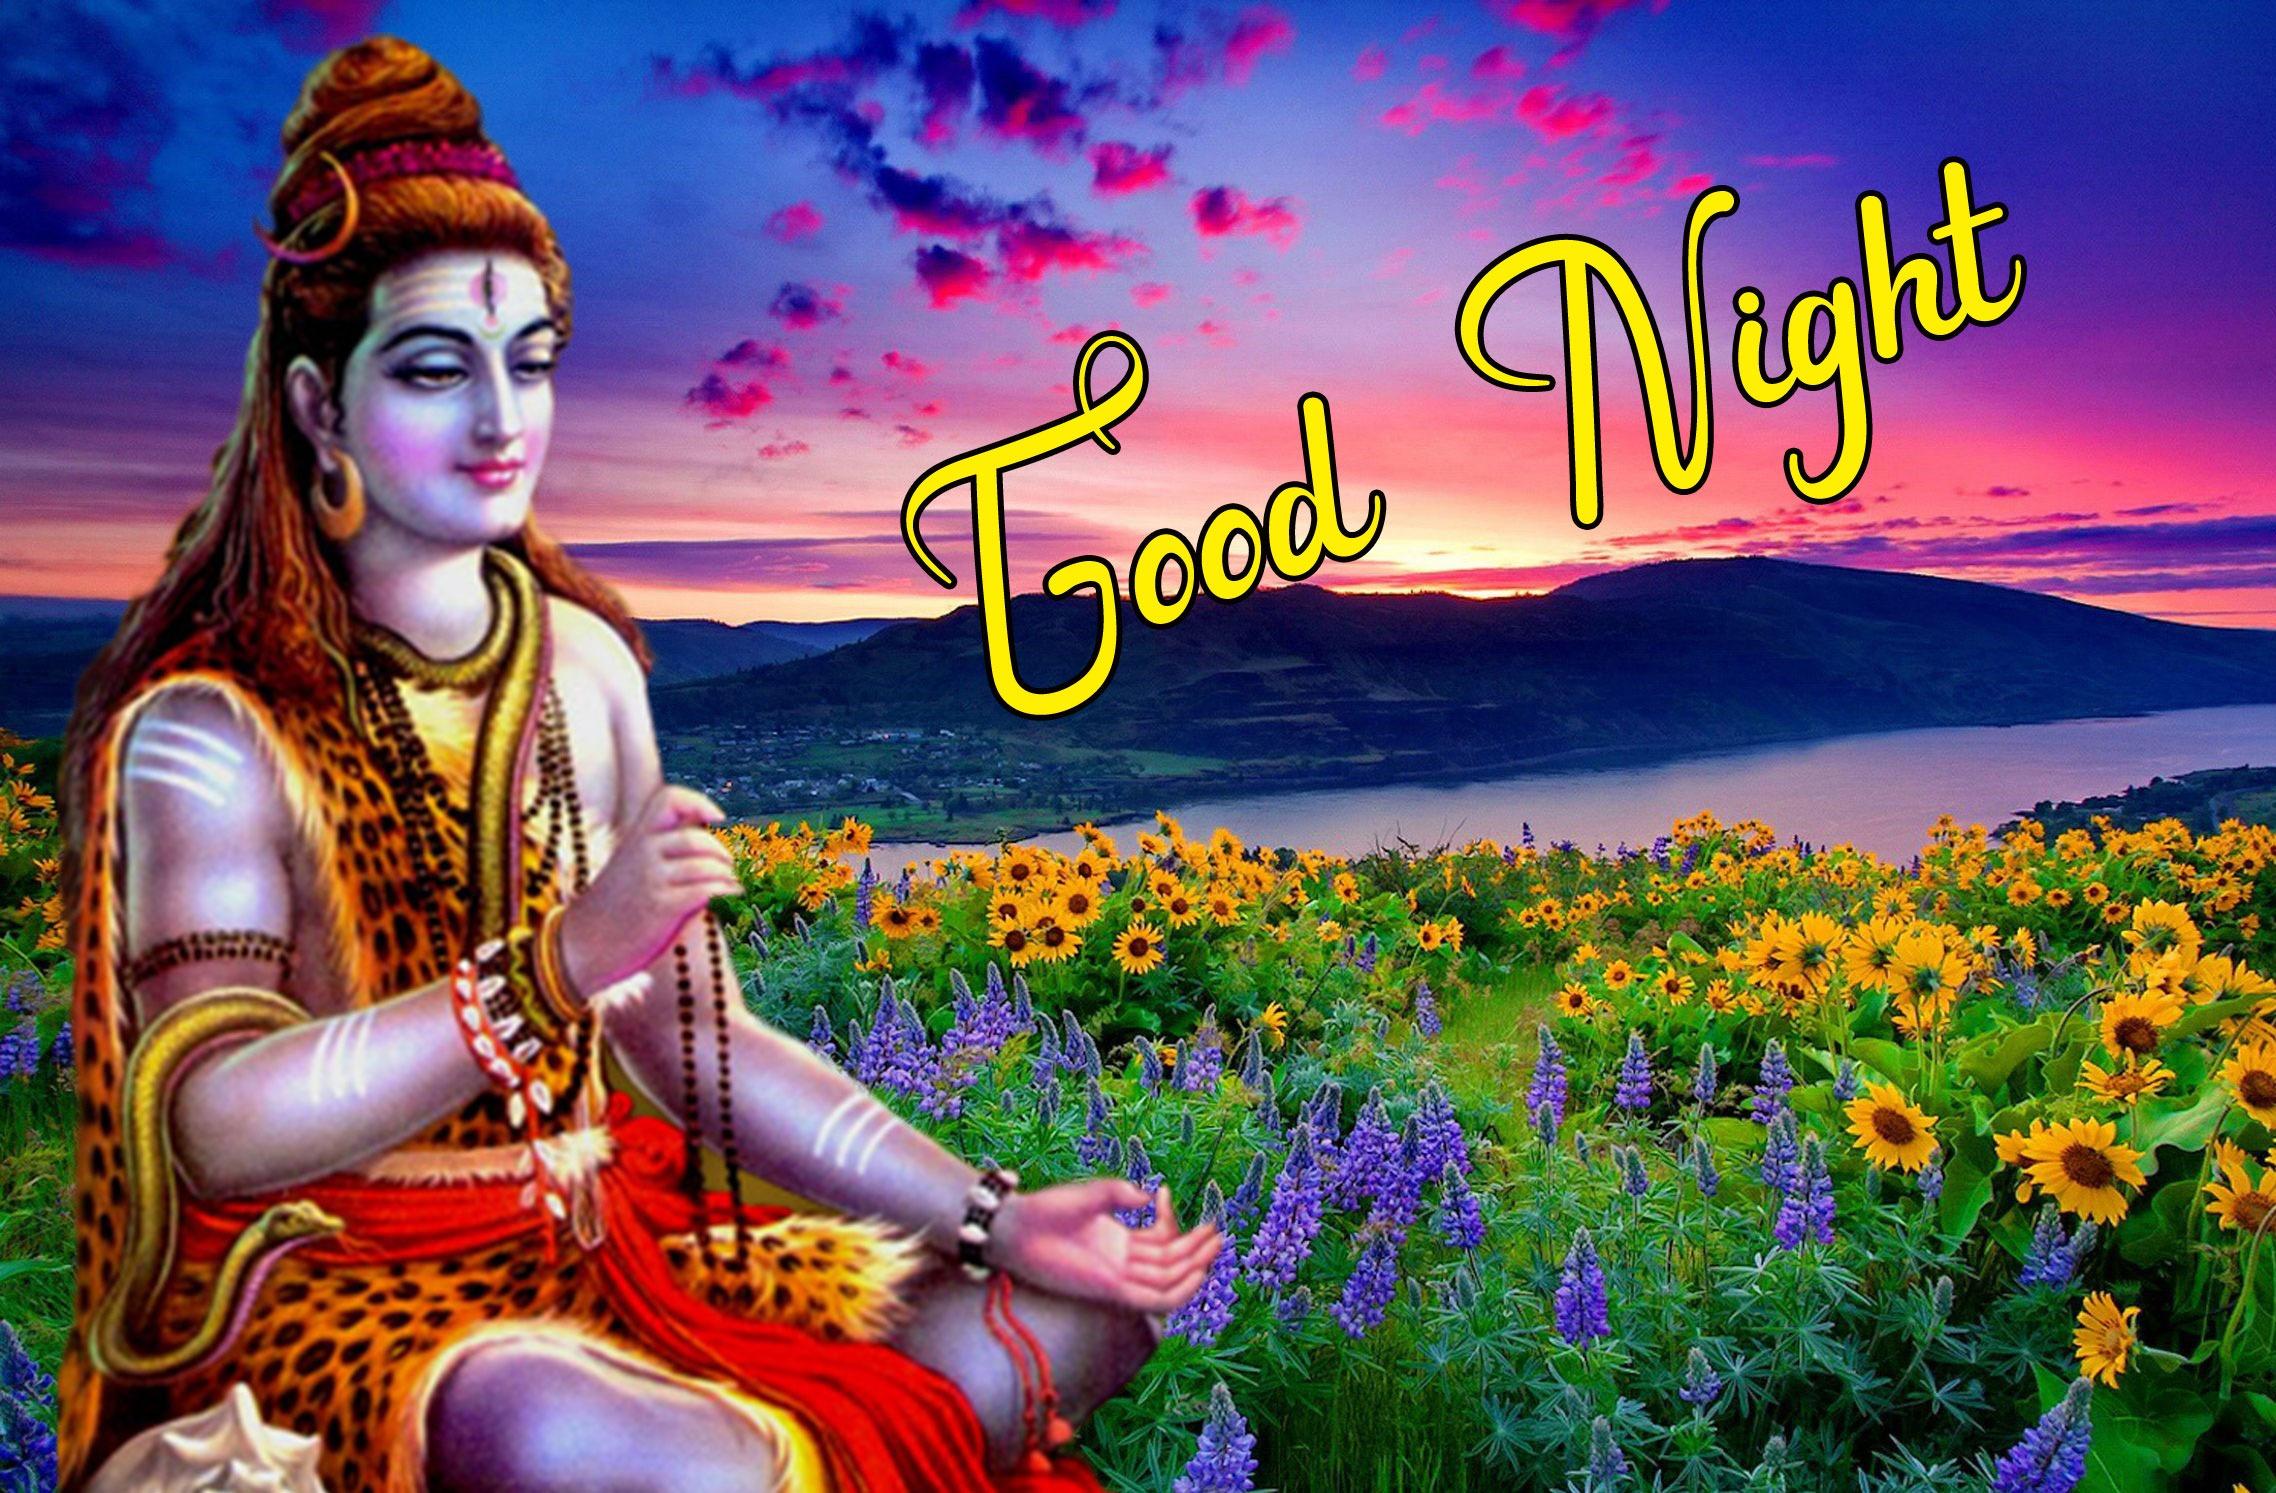 Beautiful Good Night Images wallpaper hd download